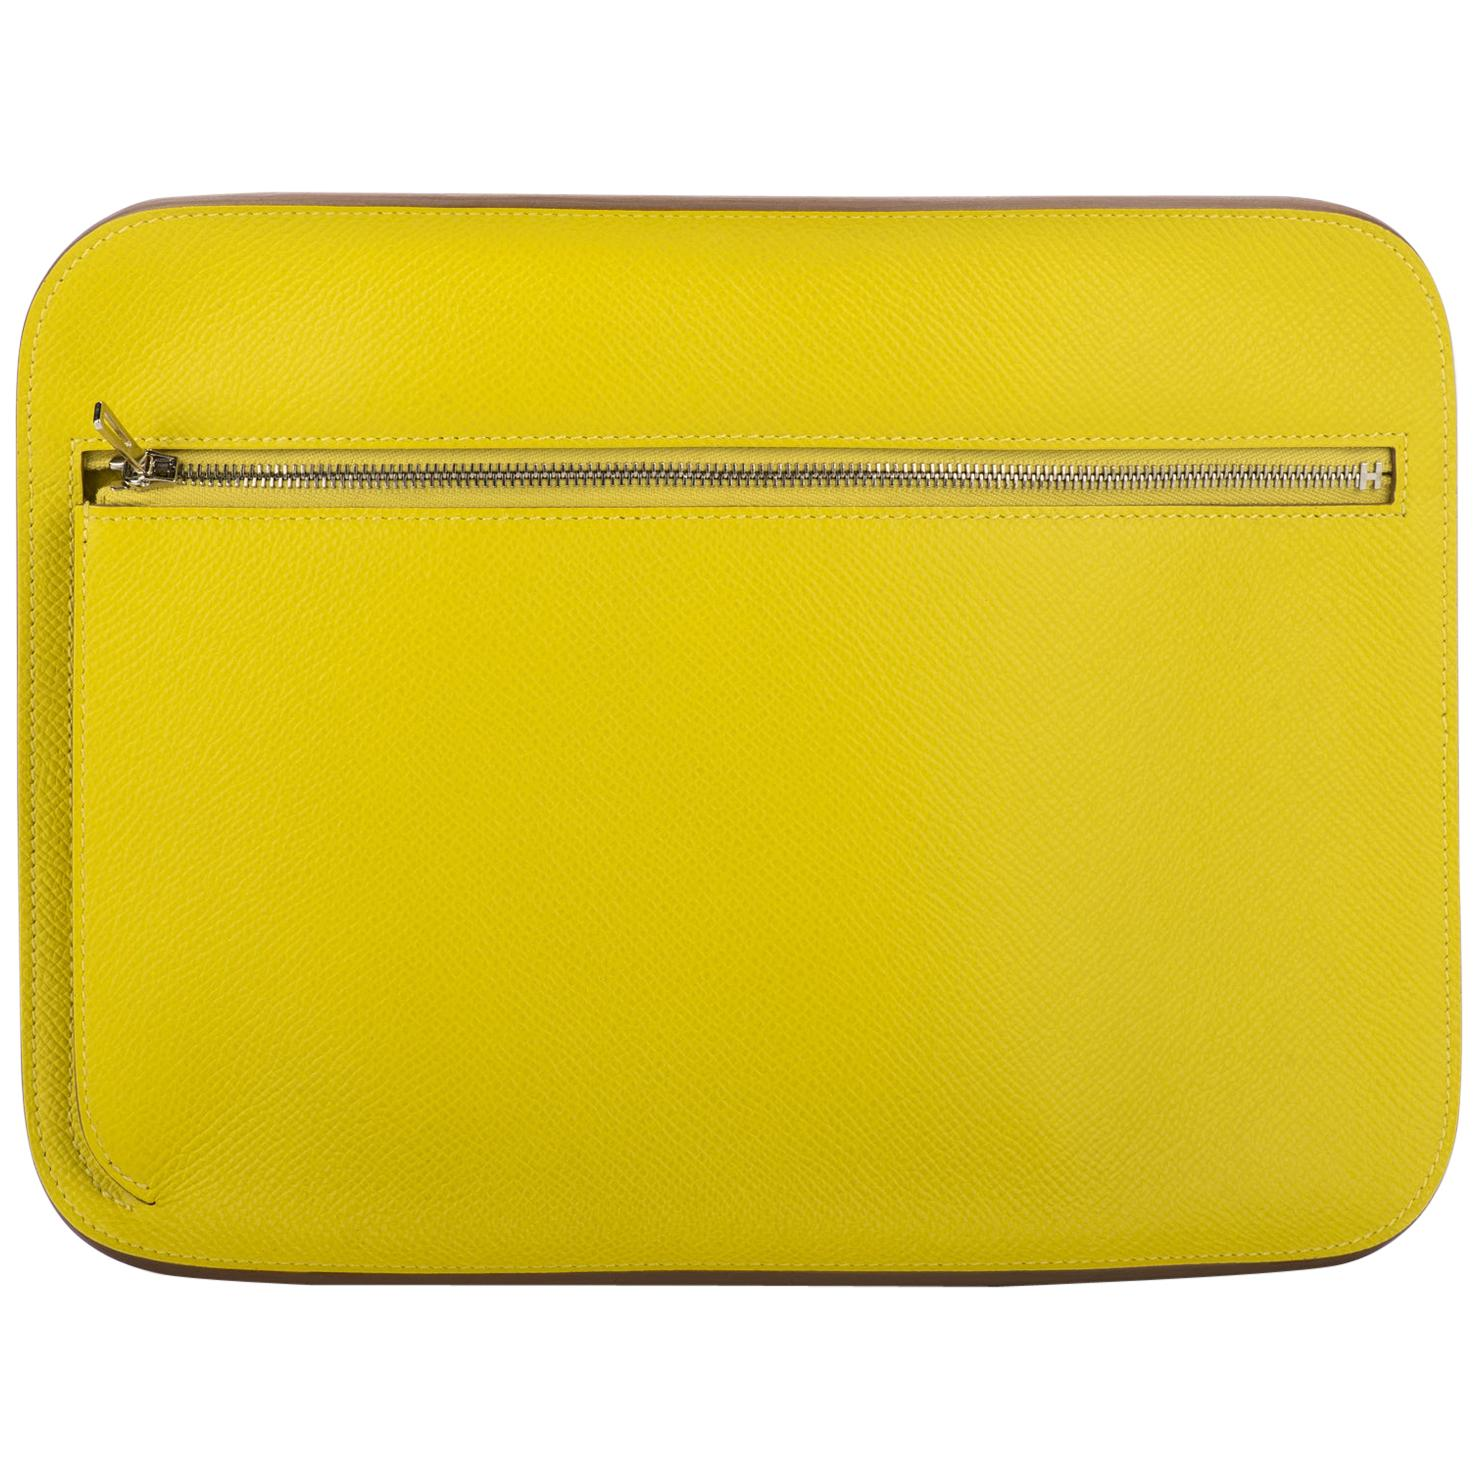 New in Box Hermès Lemon Yellow Epsom Clutch Bag